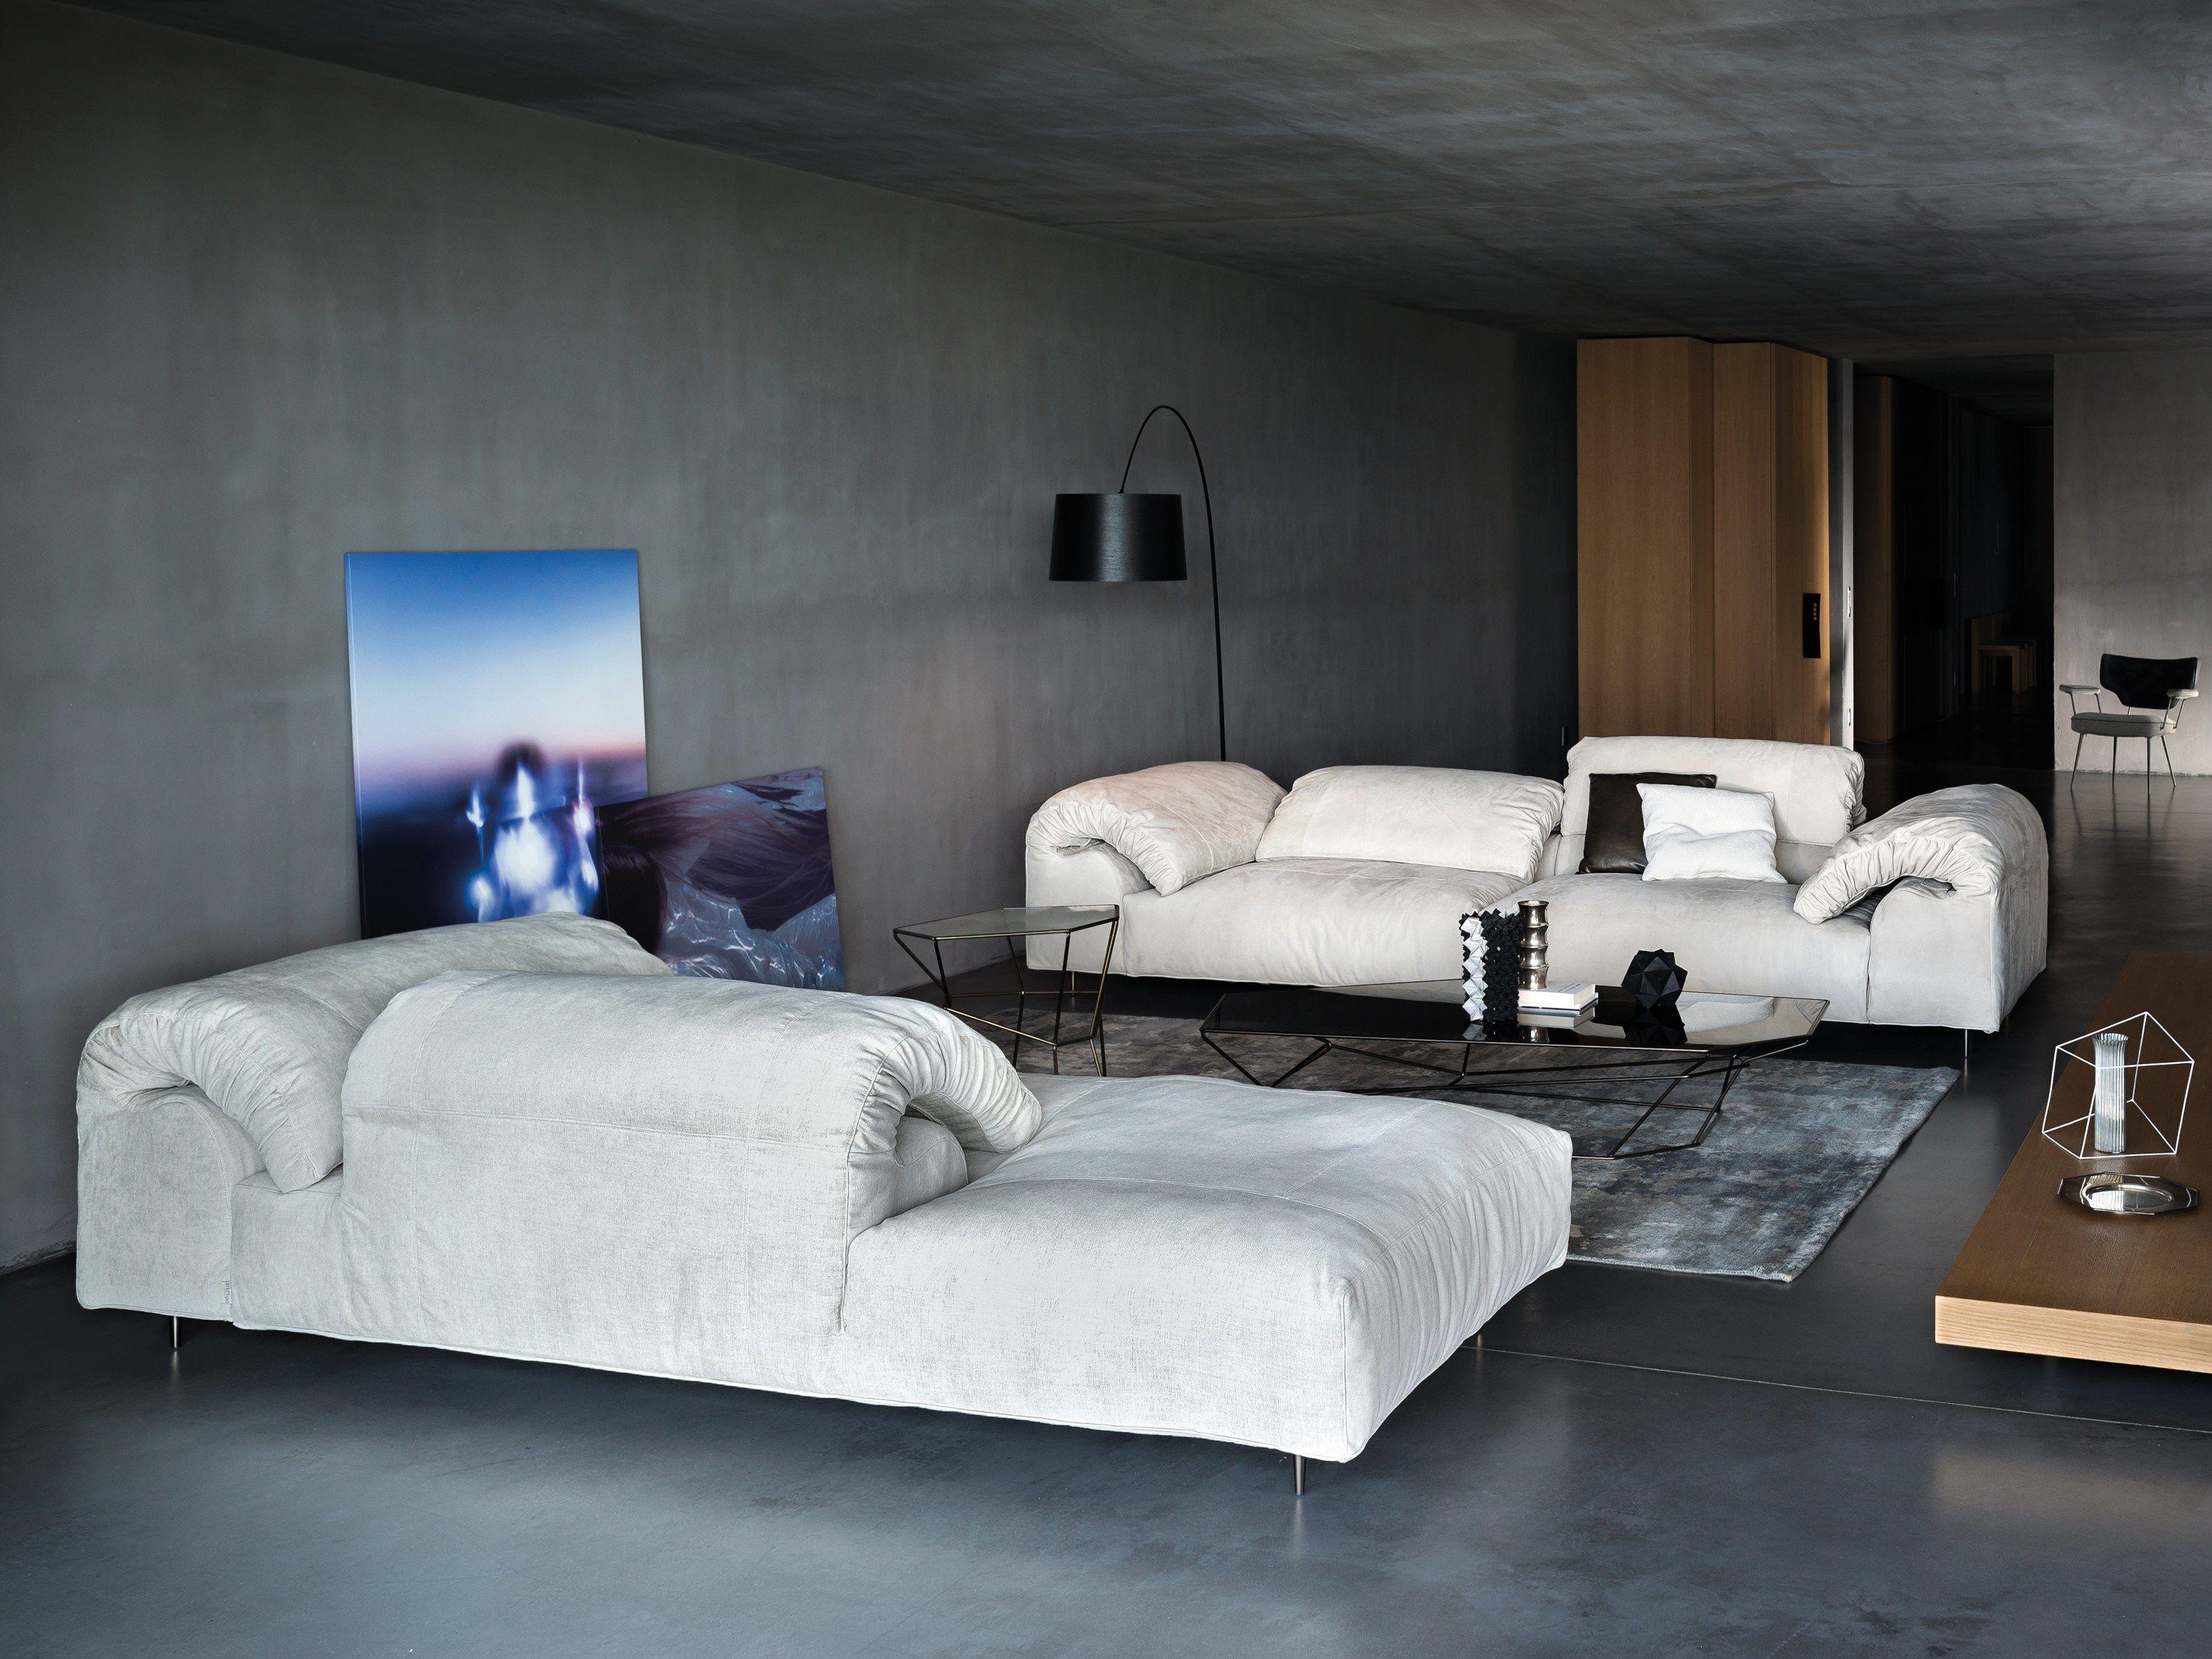 Crazy Diamond Sectional Sofa By Arketipo Design Giuseppe Viganò